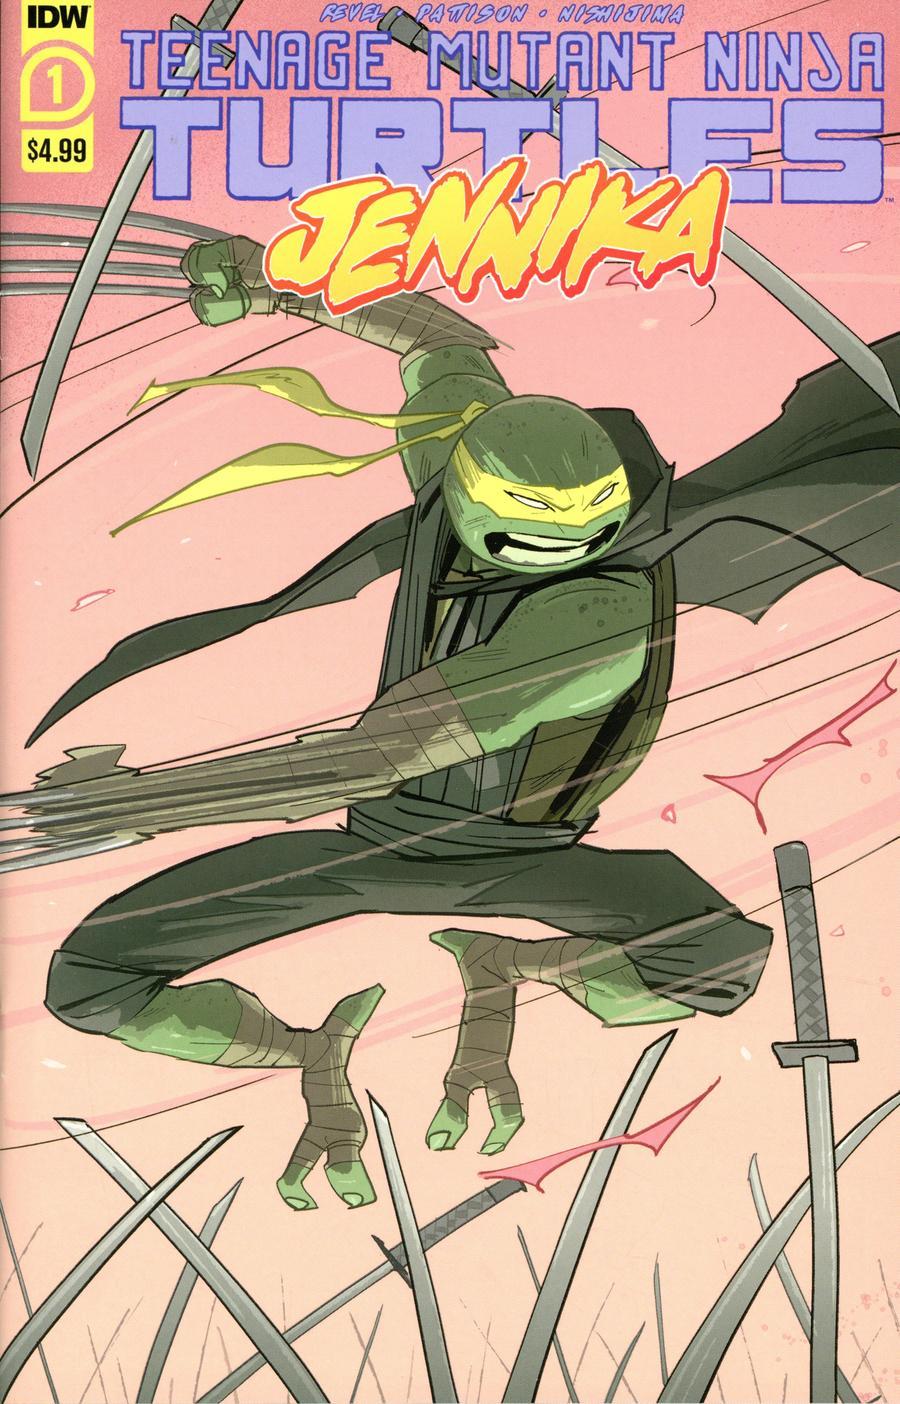 Teenage Mutant Ninja Turtles Jennika #1 Cover A Regular Brahm Revel Cover